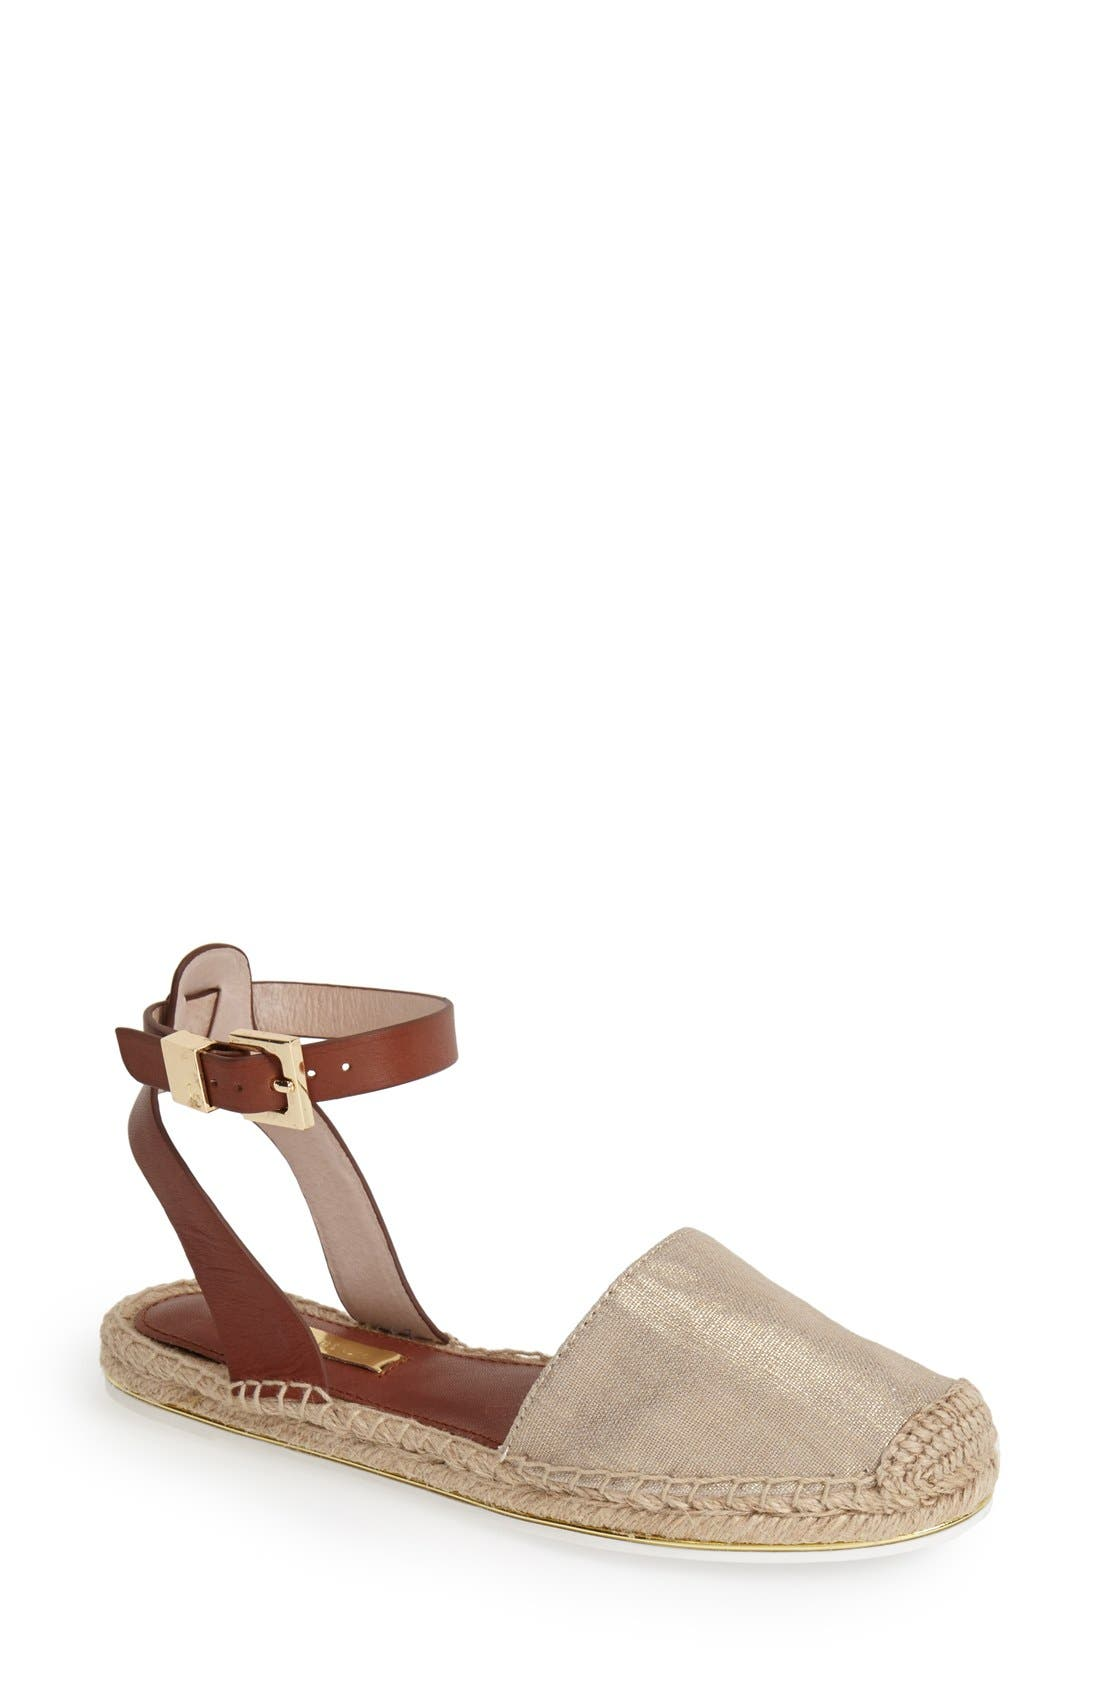 Main Image - Louise et Cie 'Frida' Ankle Strap Espadrille Flat (Women)